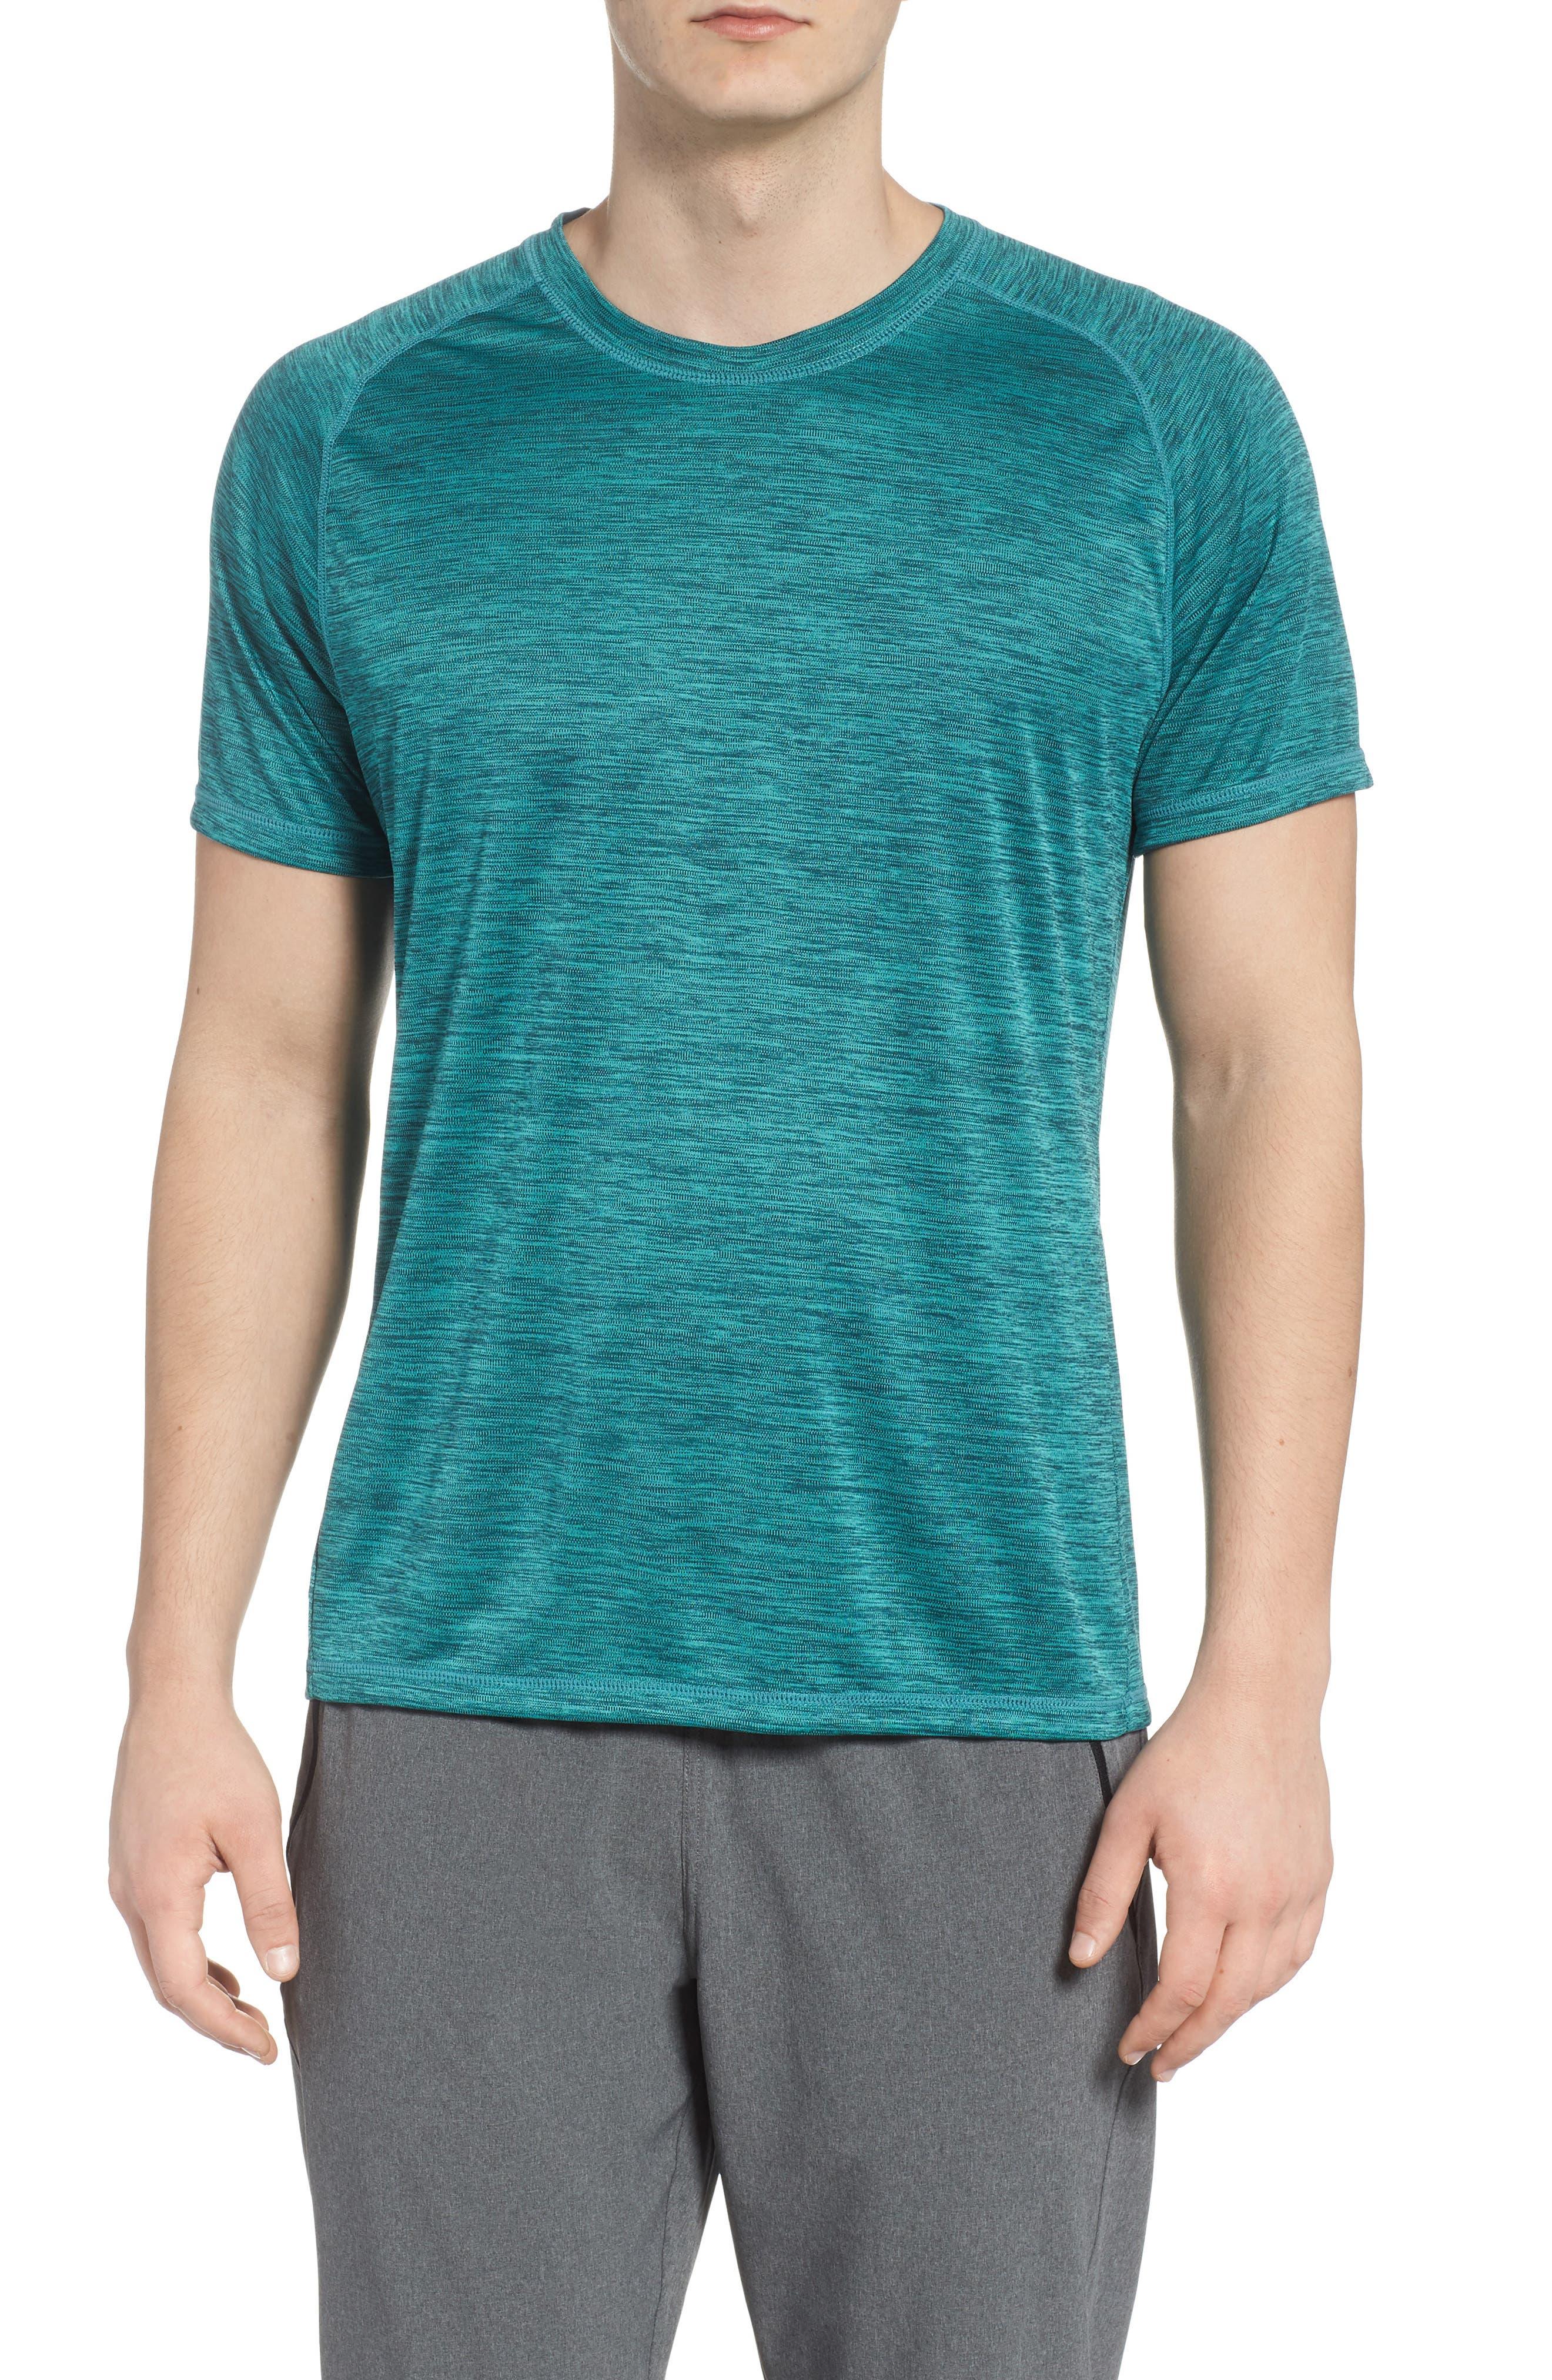 Triplite T-Shirt,                         Main,                         color, Teal Tourmaline Melange